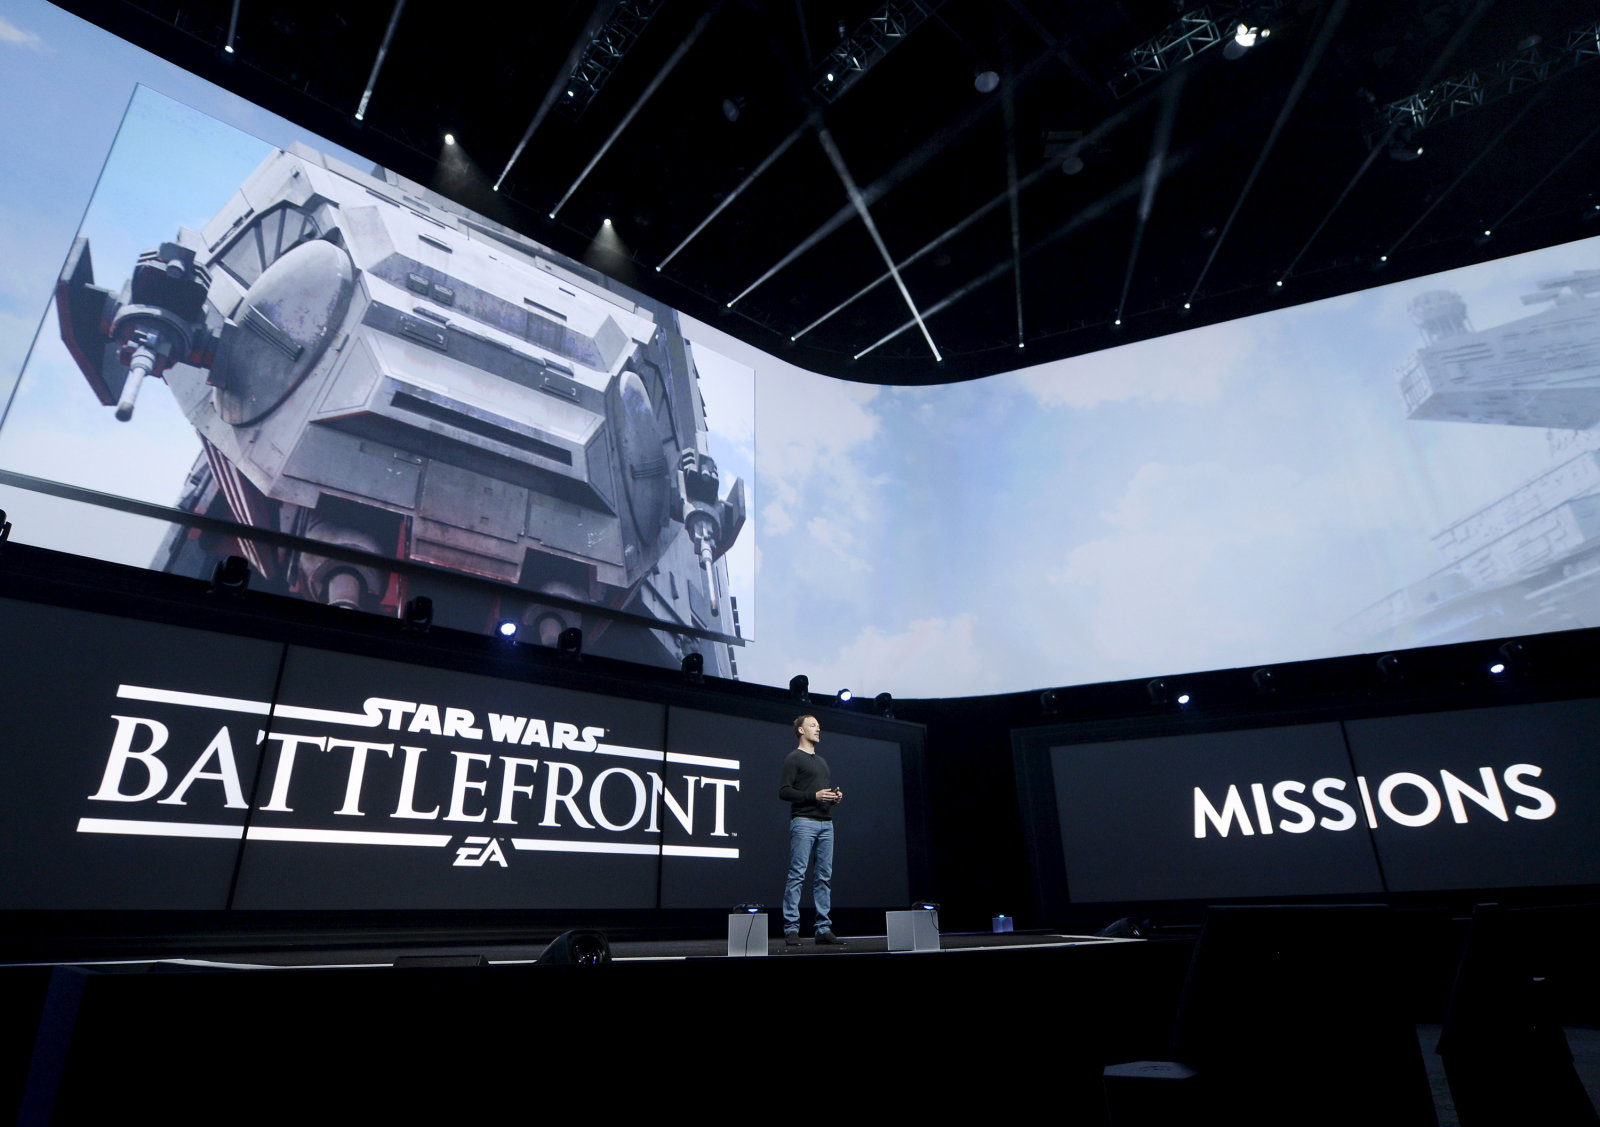 Star Wars Battlefront llegará a PlayStation VR el 6 de diciembre